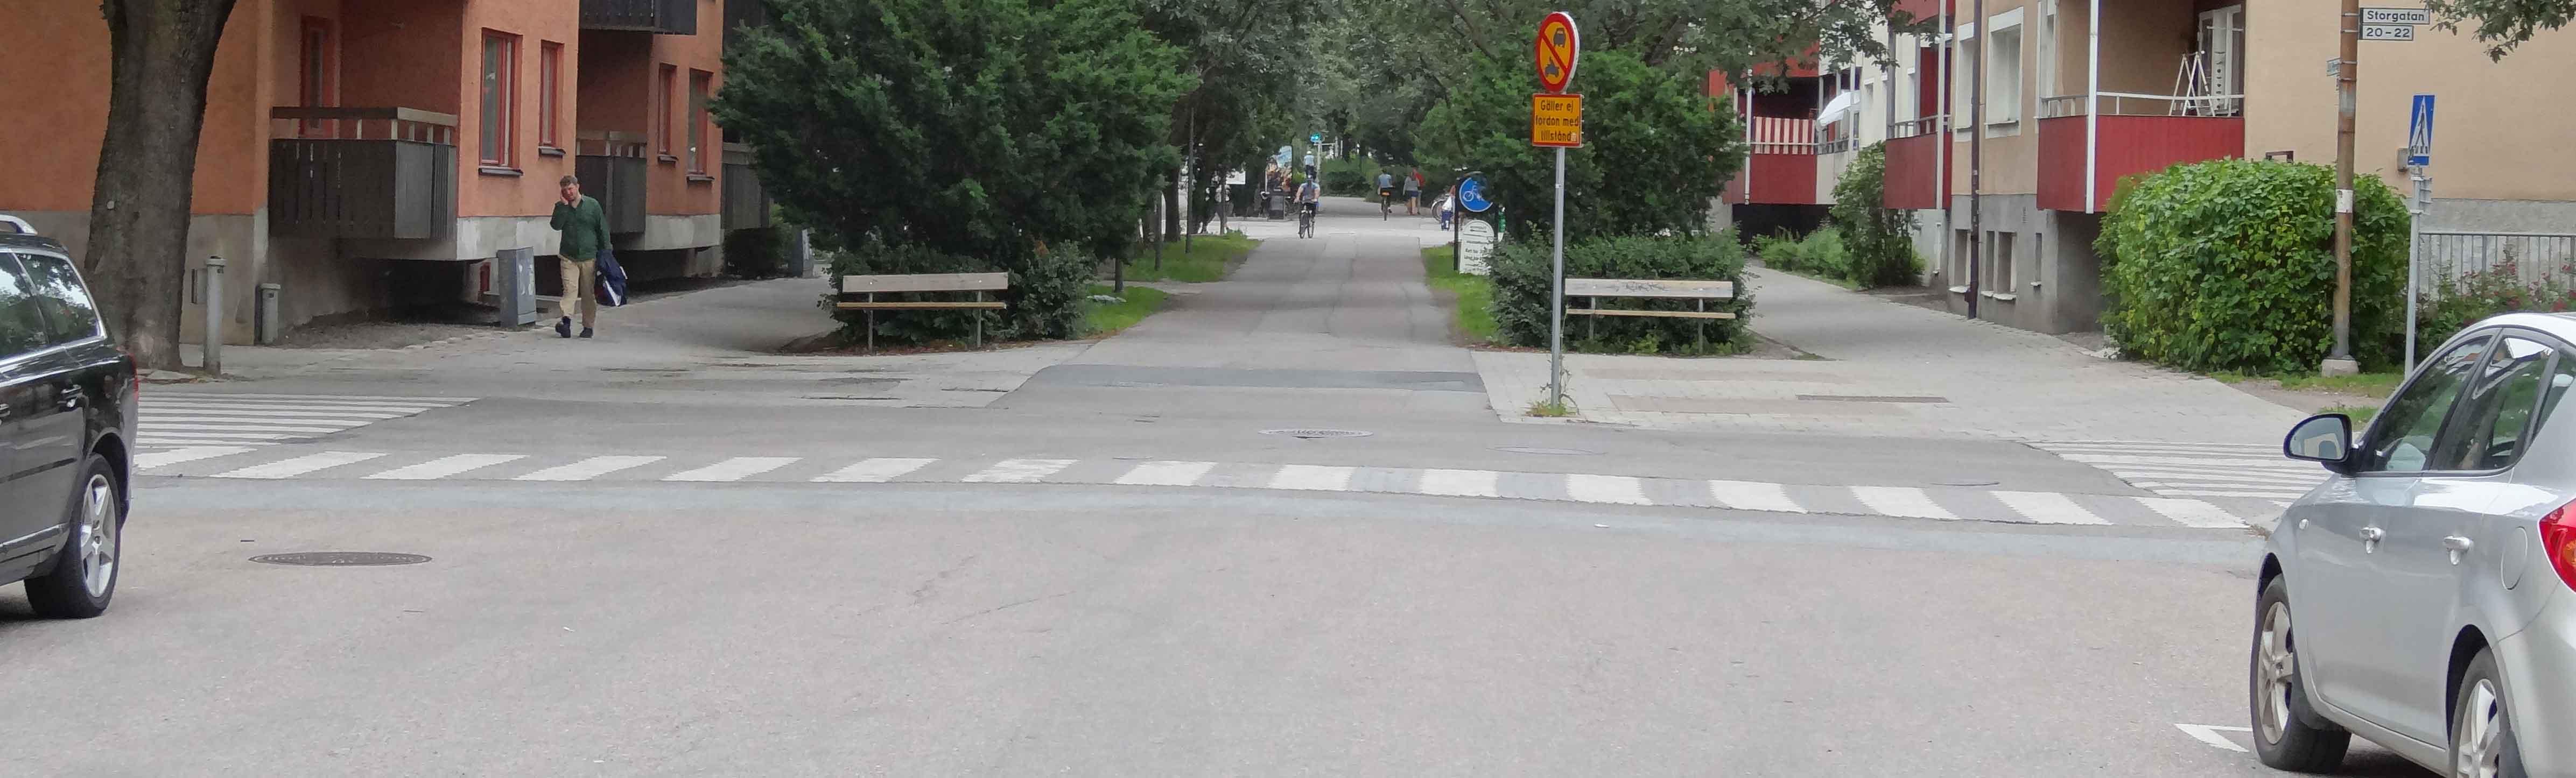 CykeloverfartStPersgStorg